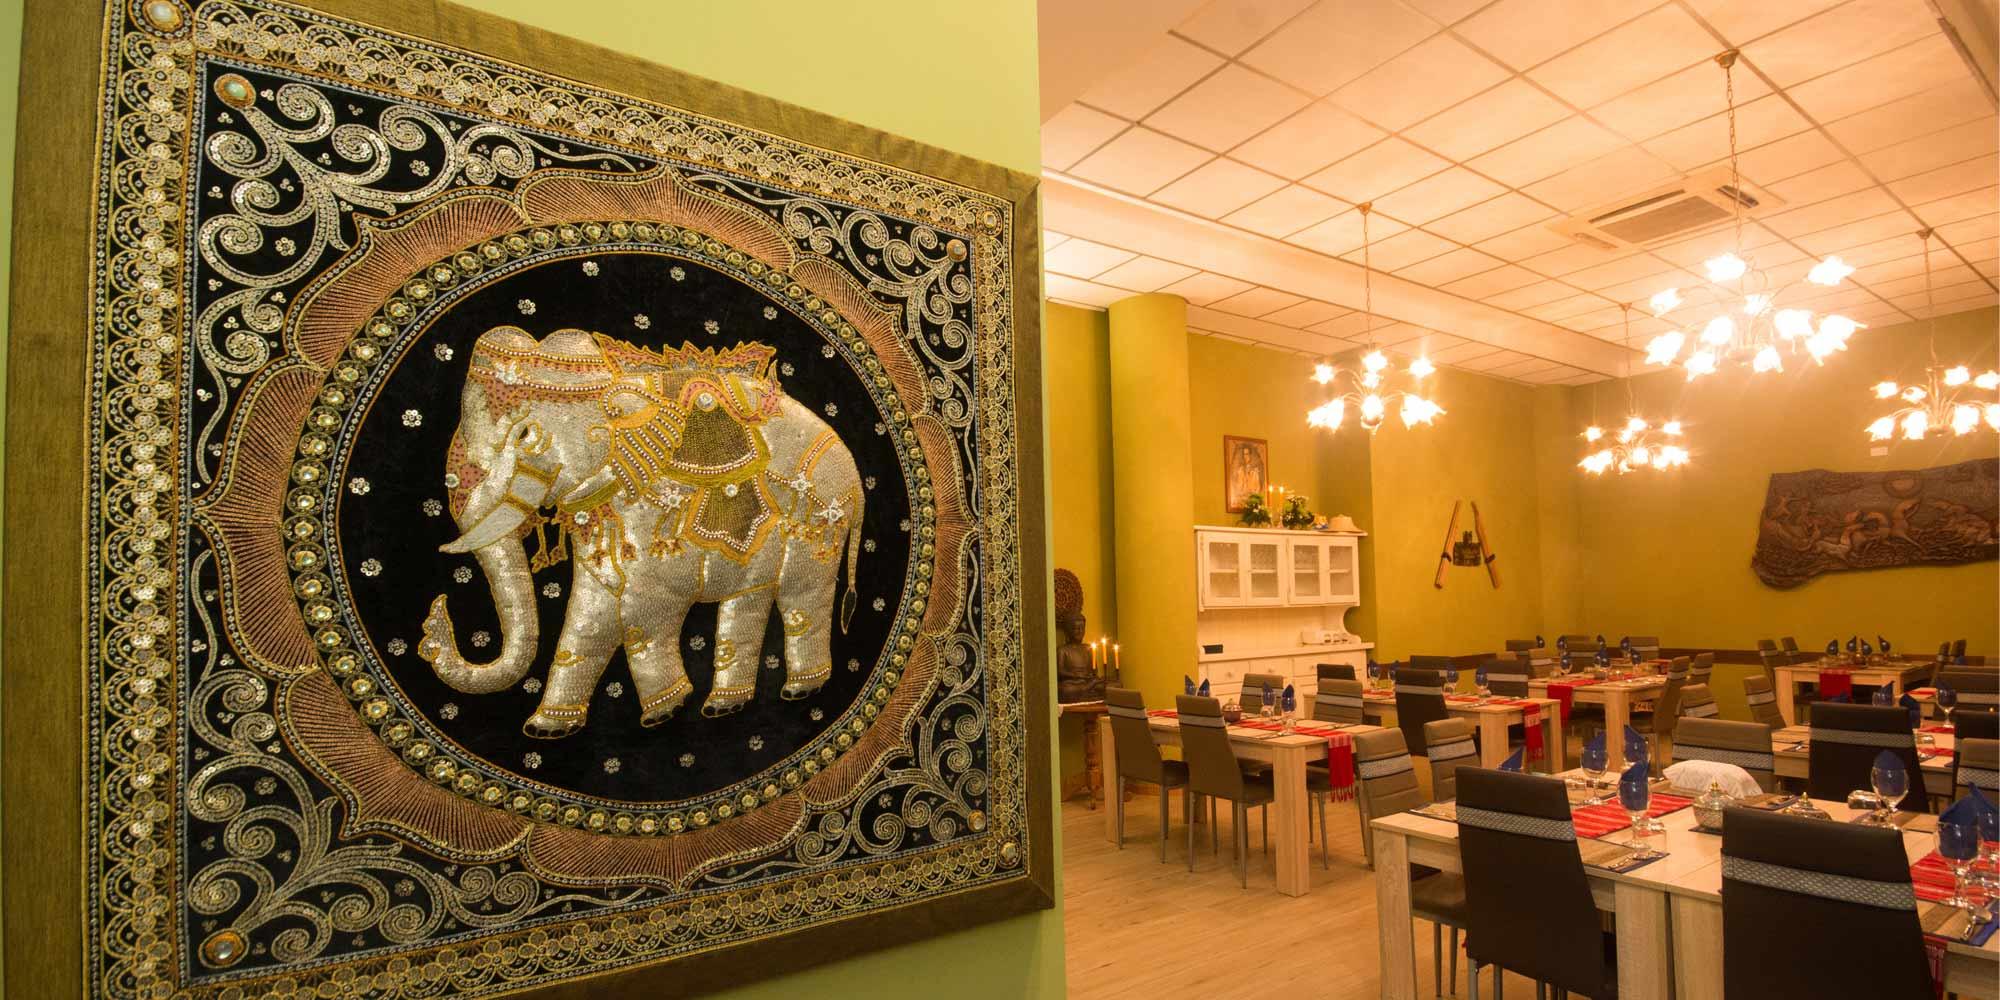 Tavoli da pranzo al Ristorante Thai Seangkan a Verona